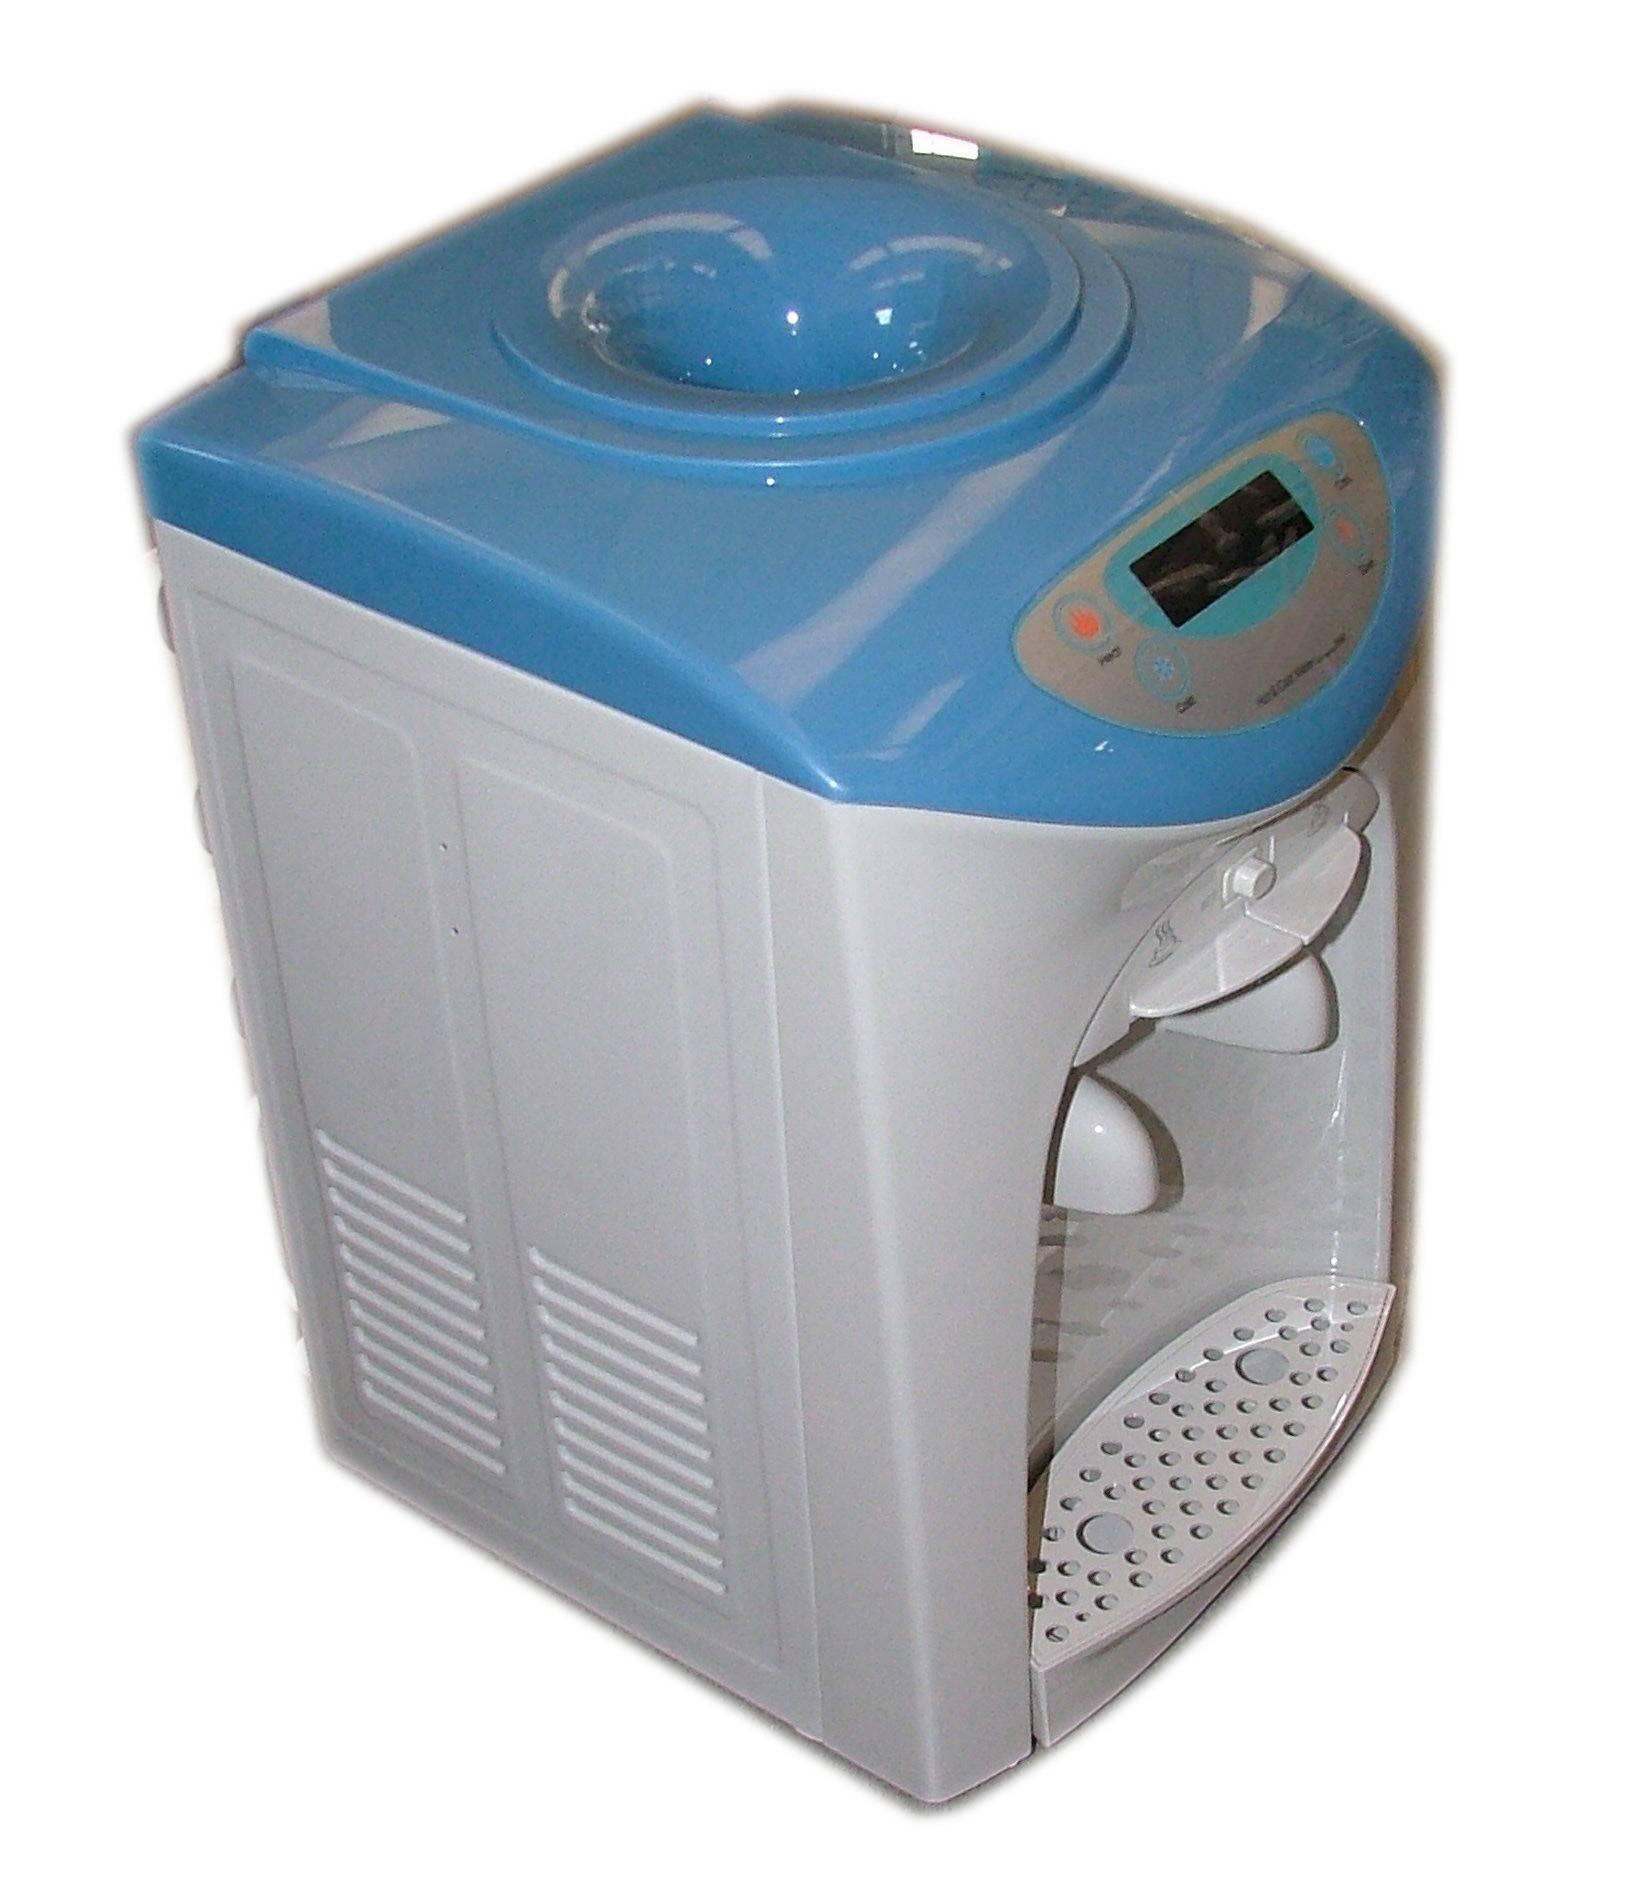 bottled type water dispenser/water cooler /Compact Cooler LC-20TN5